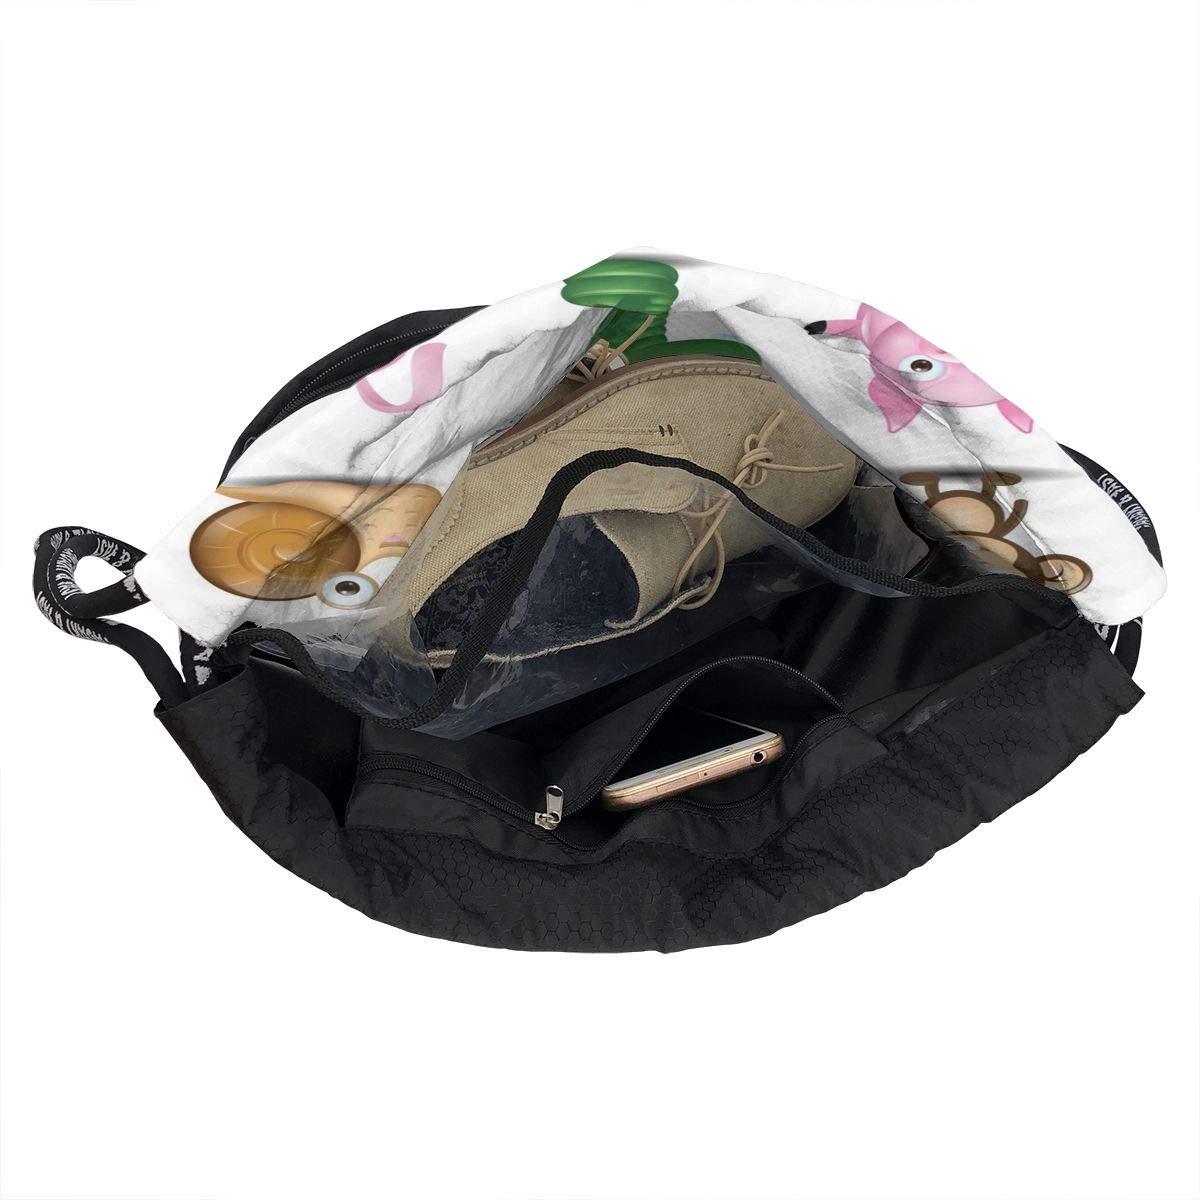 Unisex Bundle Backpack Set Of Cute Animals Sitting In Cardboard Boxes Travel Durable Large Space Vintage Waterproof Drawstring Bag